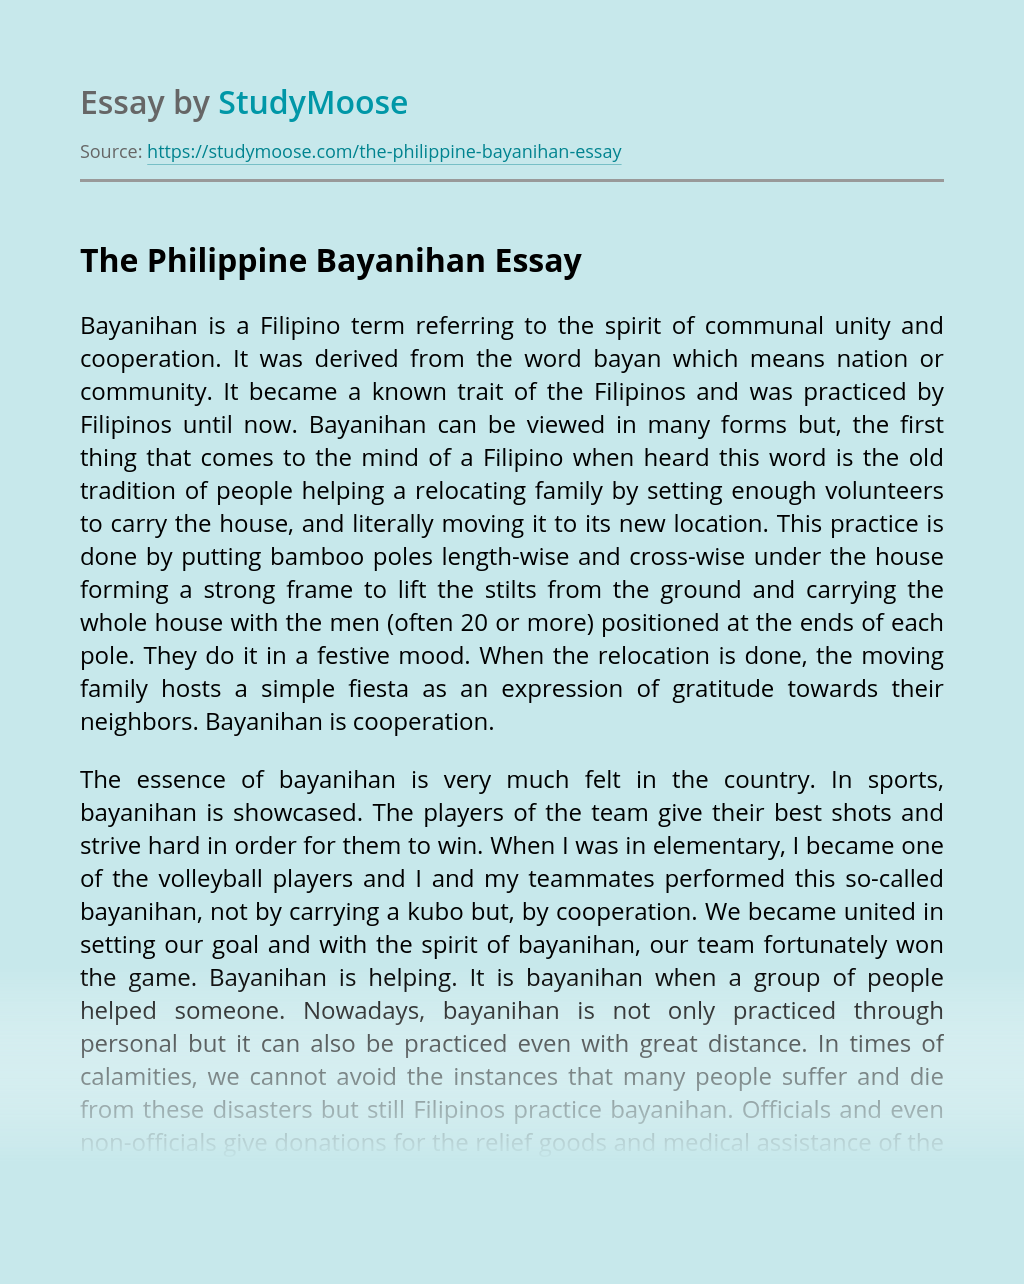 The Philippine Bayanihan